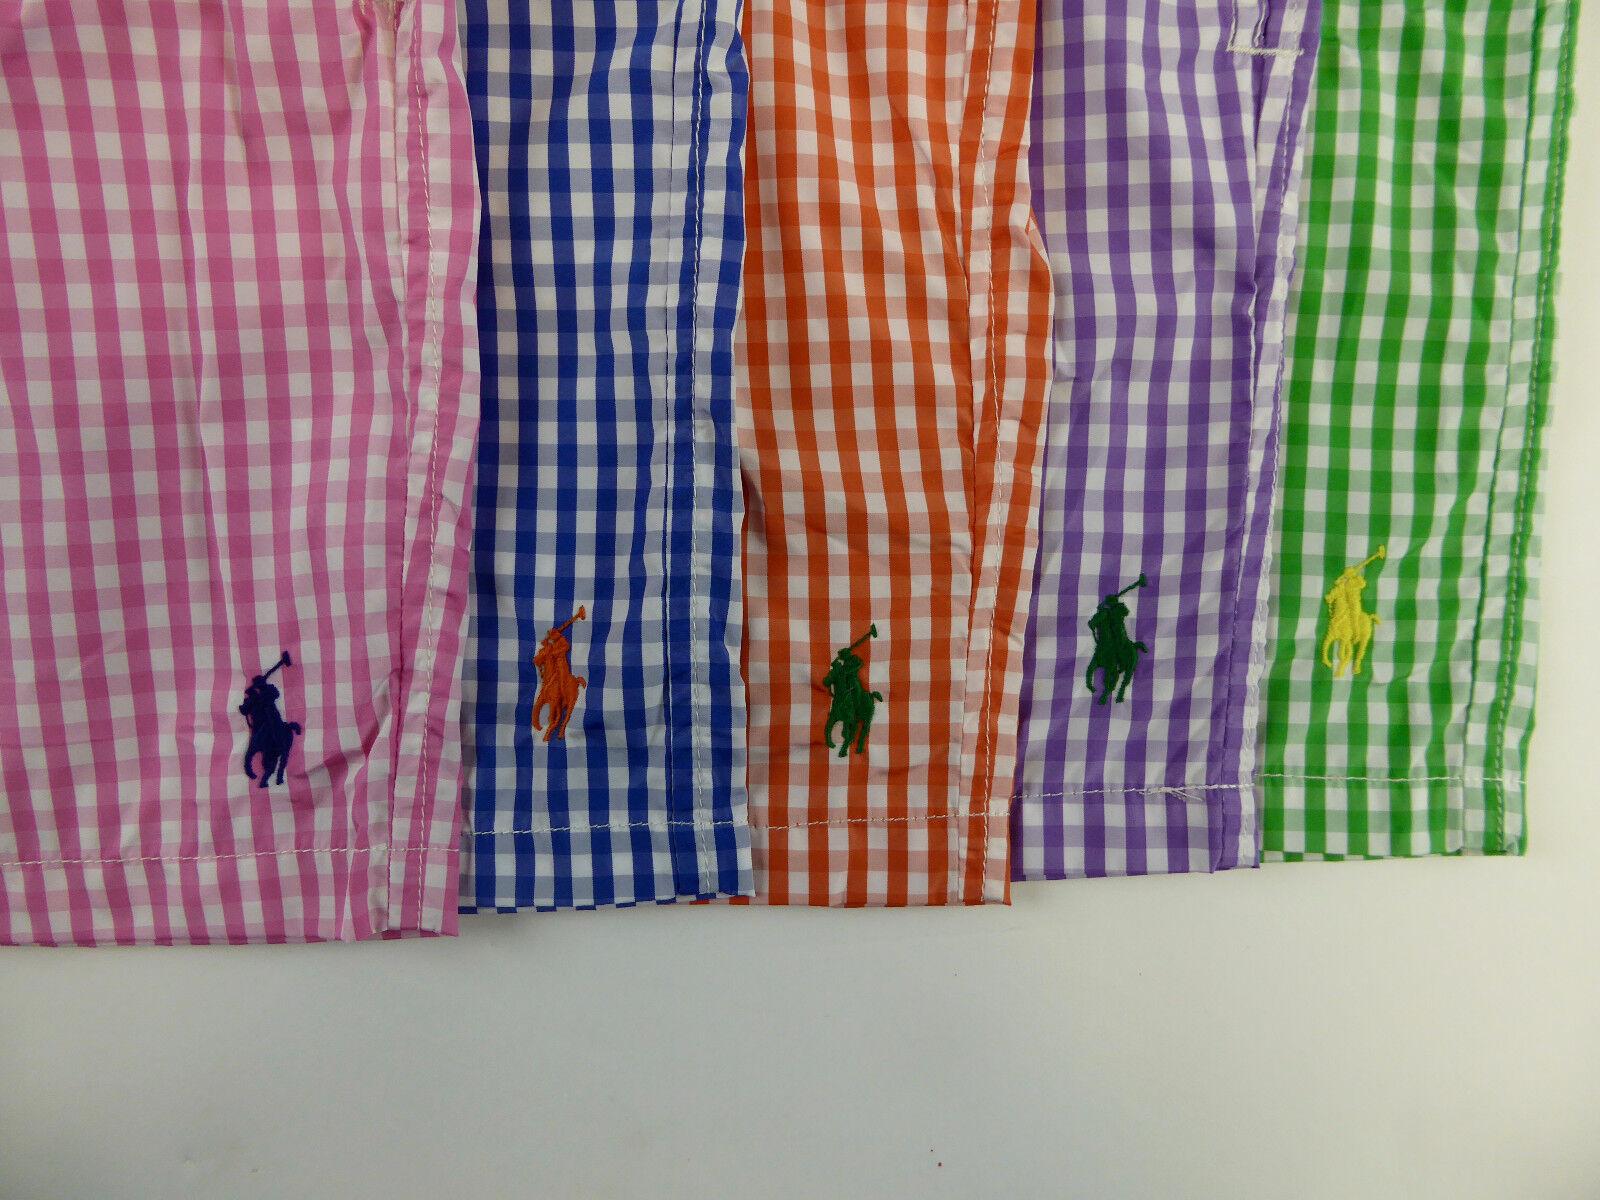 Polo Ralph Lauren Gingham Plaid Traveler Swim Wear Trunks Shorts -79 Pony NWT